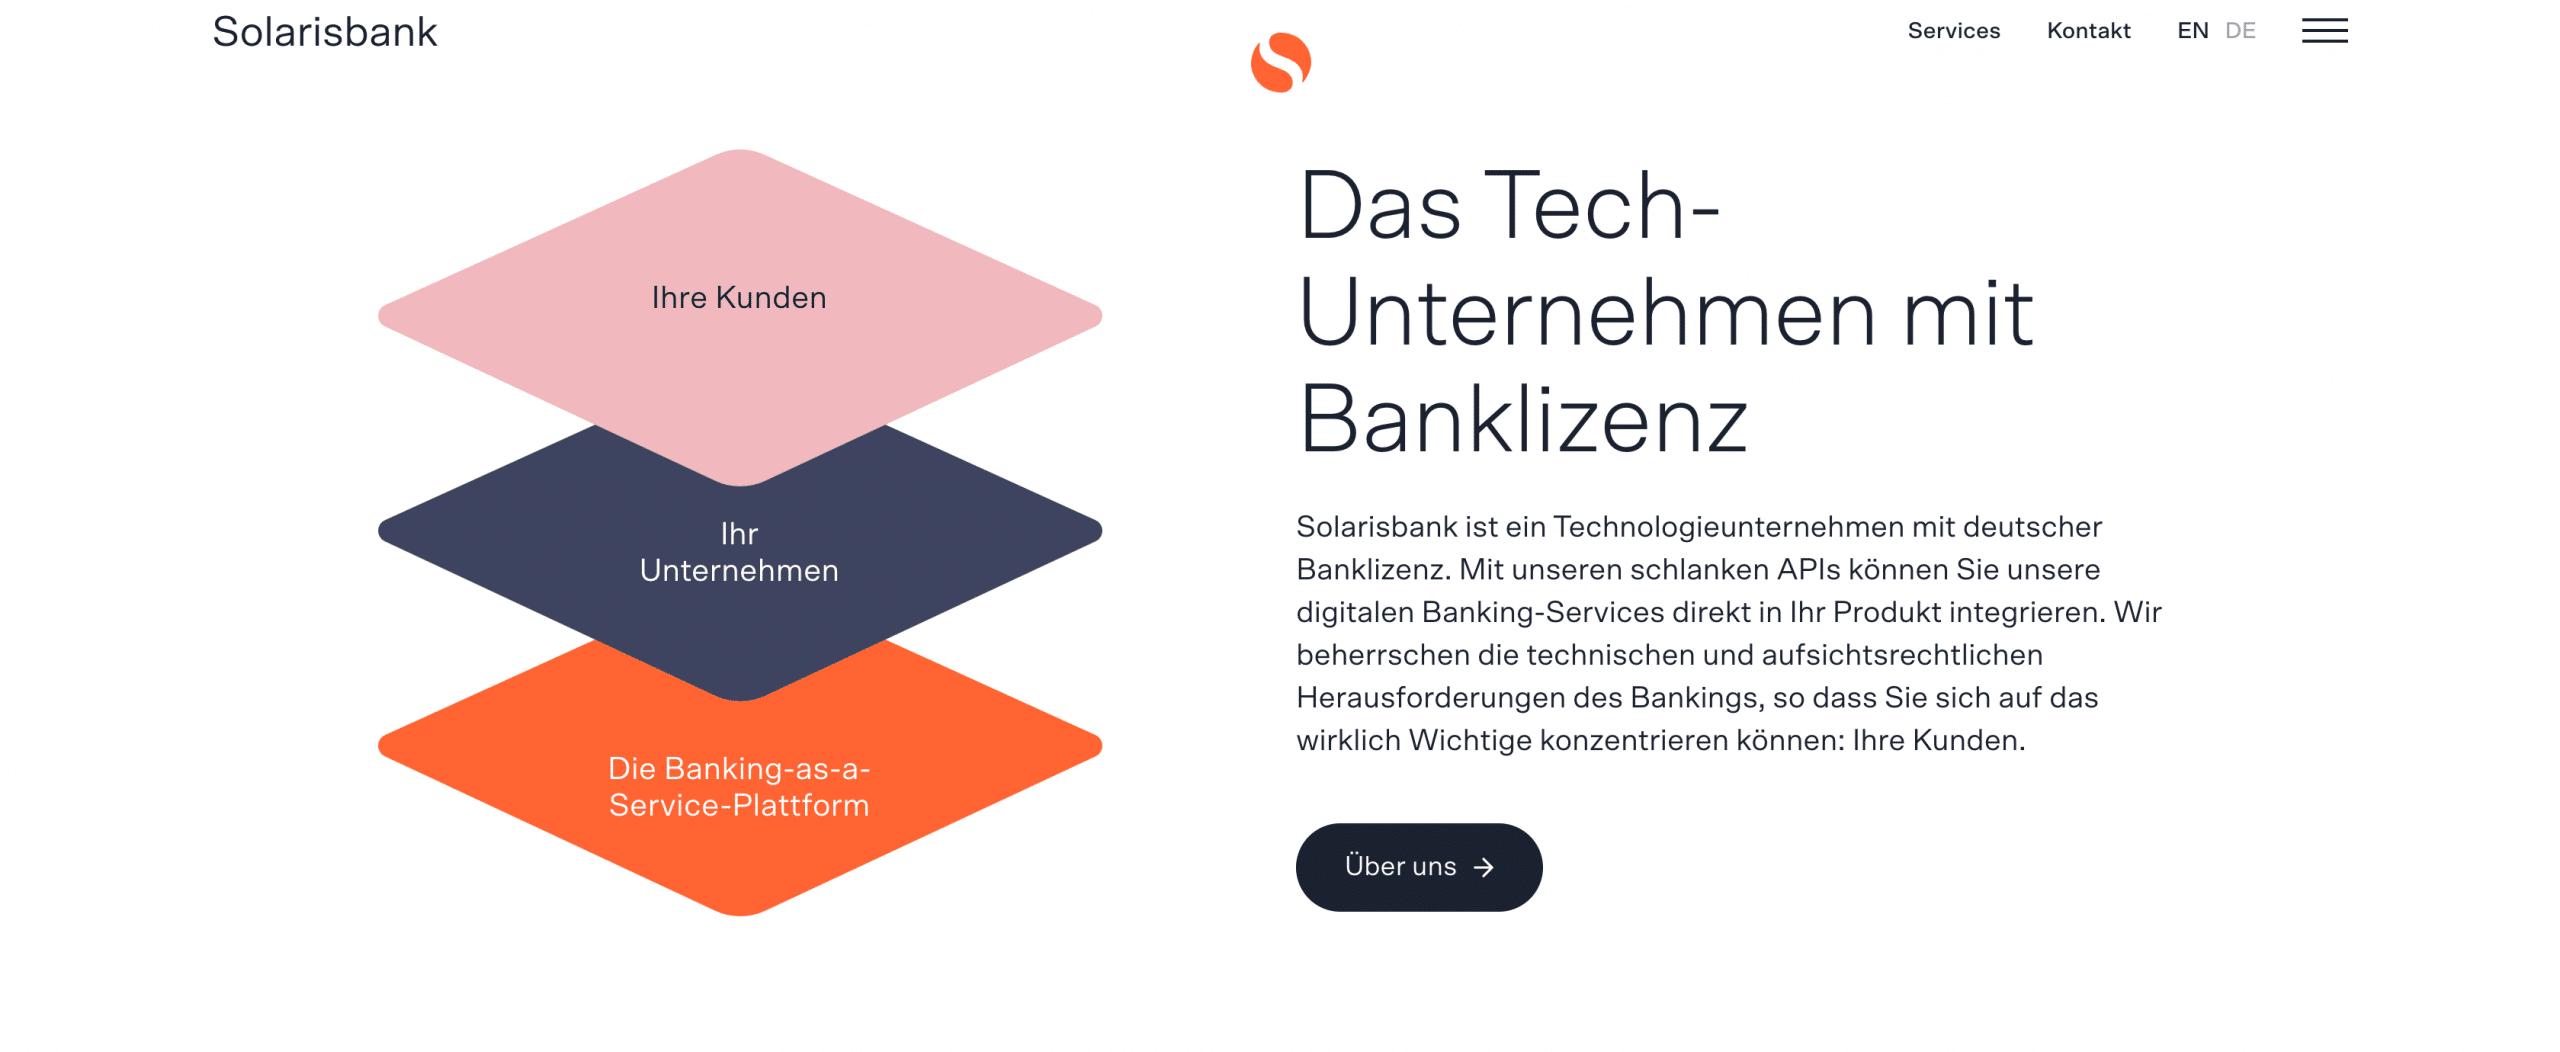 Solarisbank Fazit